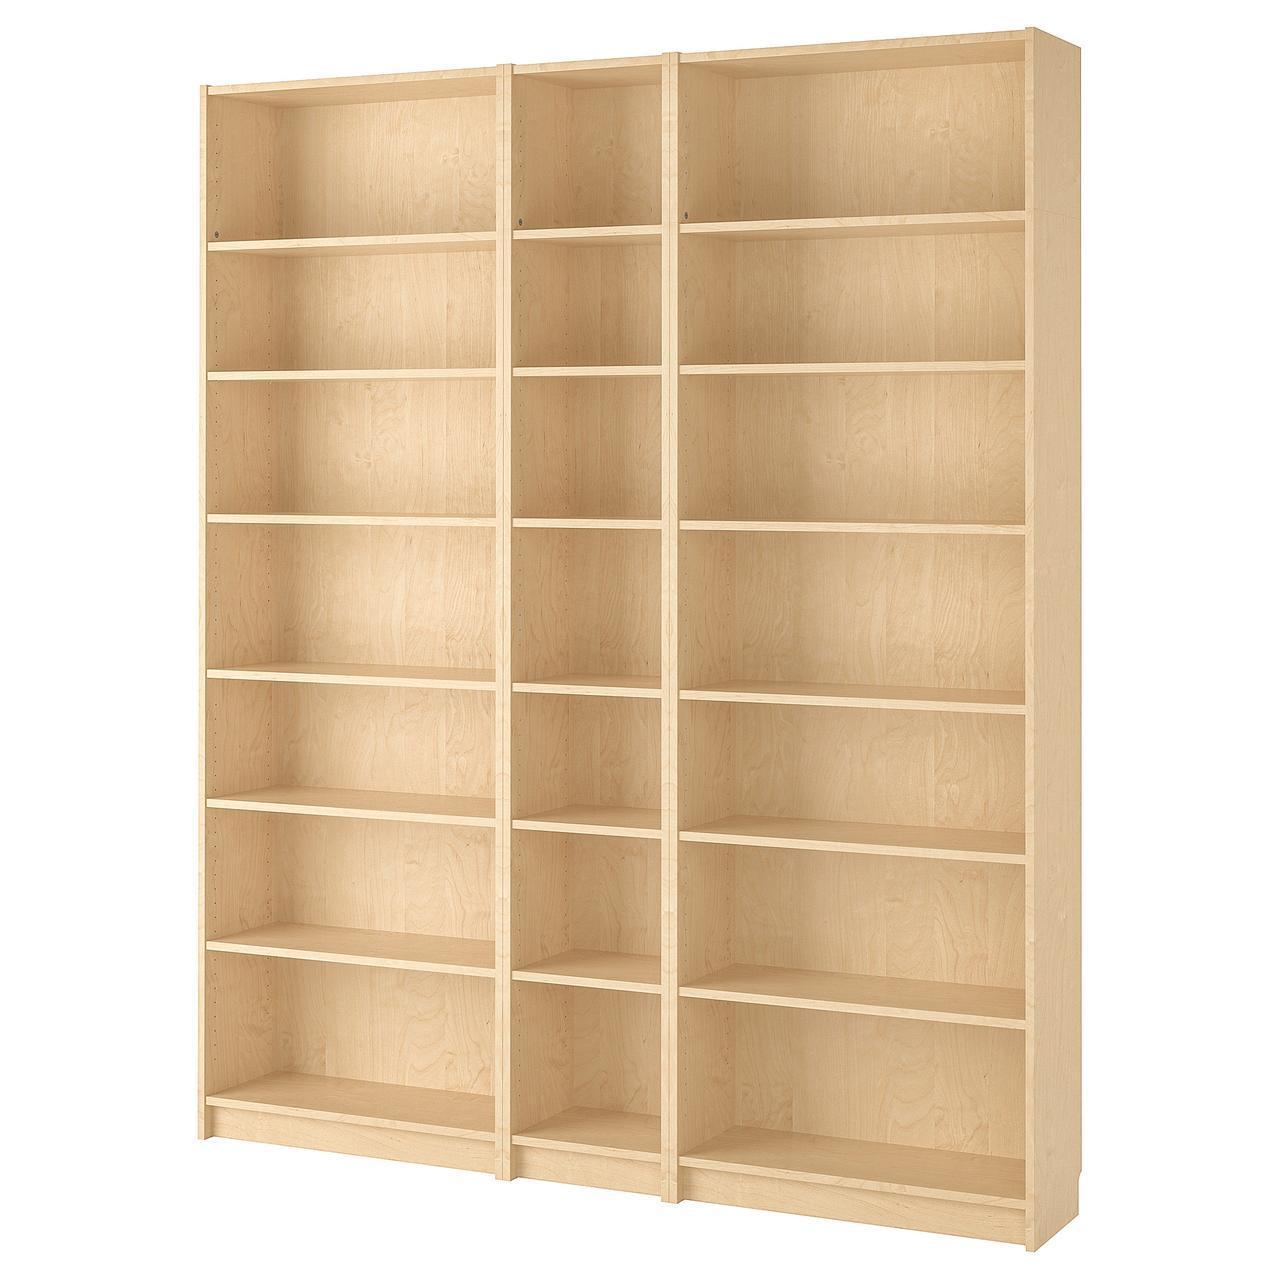 IKEA BILLY Книжный шкаф, березовый шпон  (690.234.00)